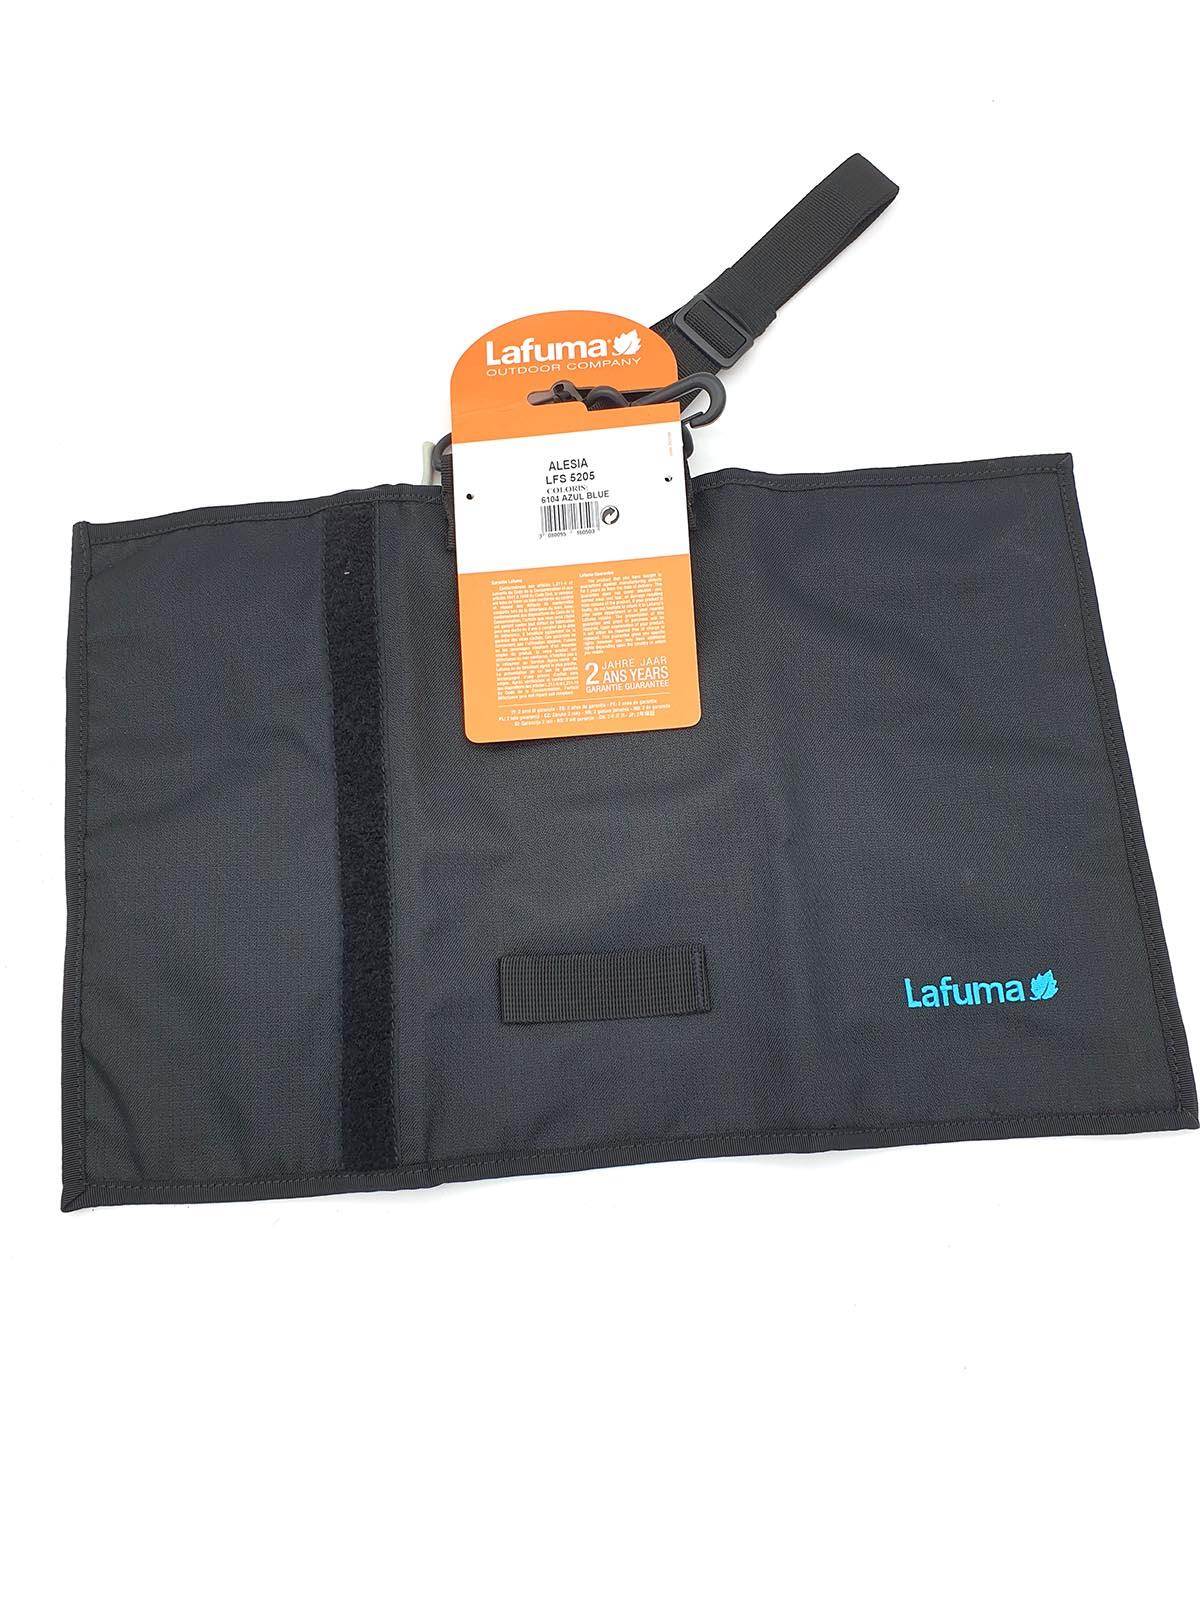 Lafuma Alesia Organizer Çanta Lfs5205 FD5